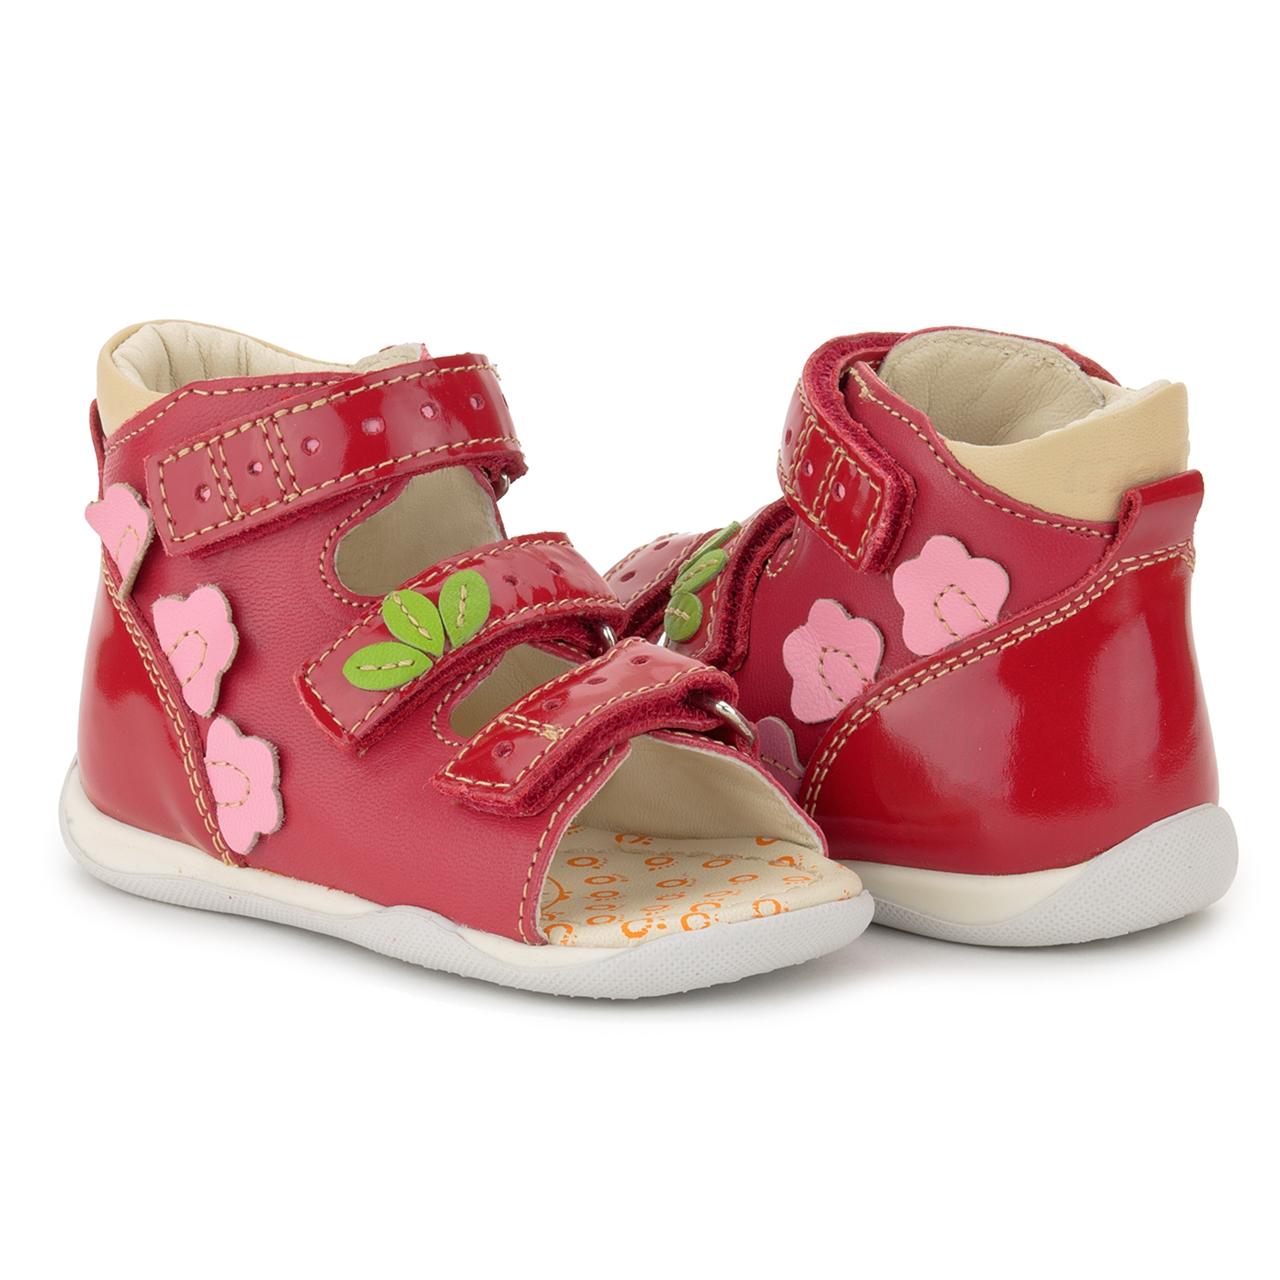 Memo Shoes Memo Dino 3HA Red Infant & Toddler Girl & Boy